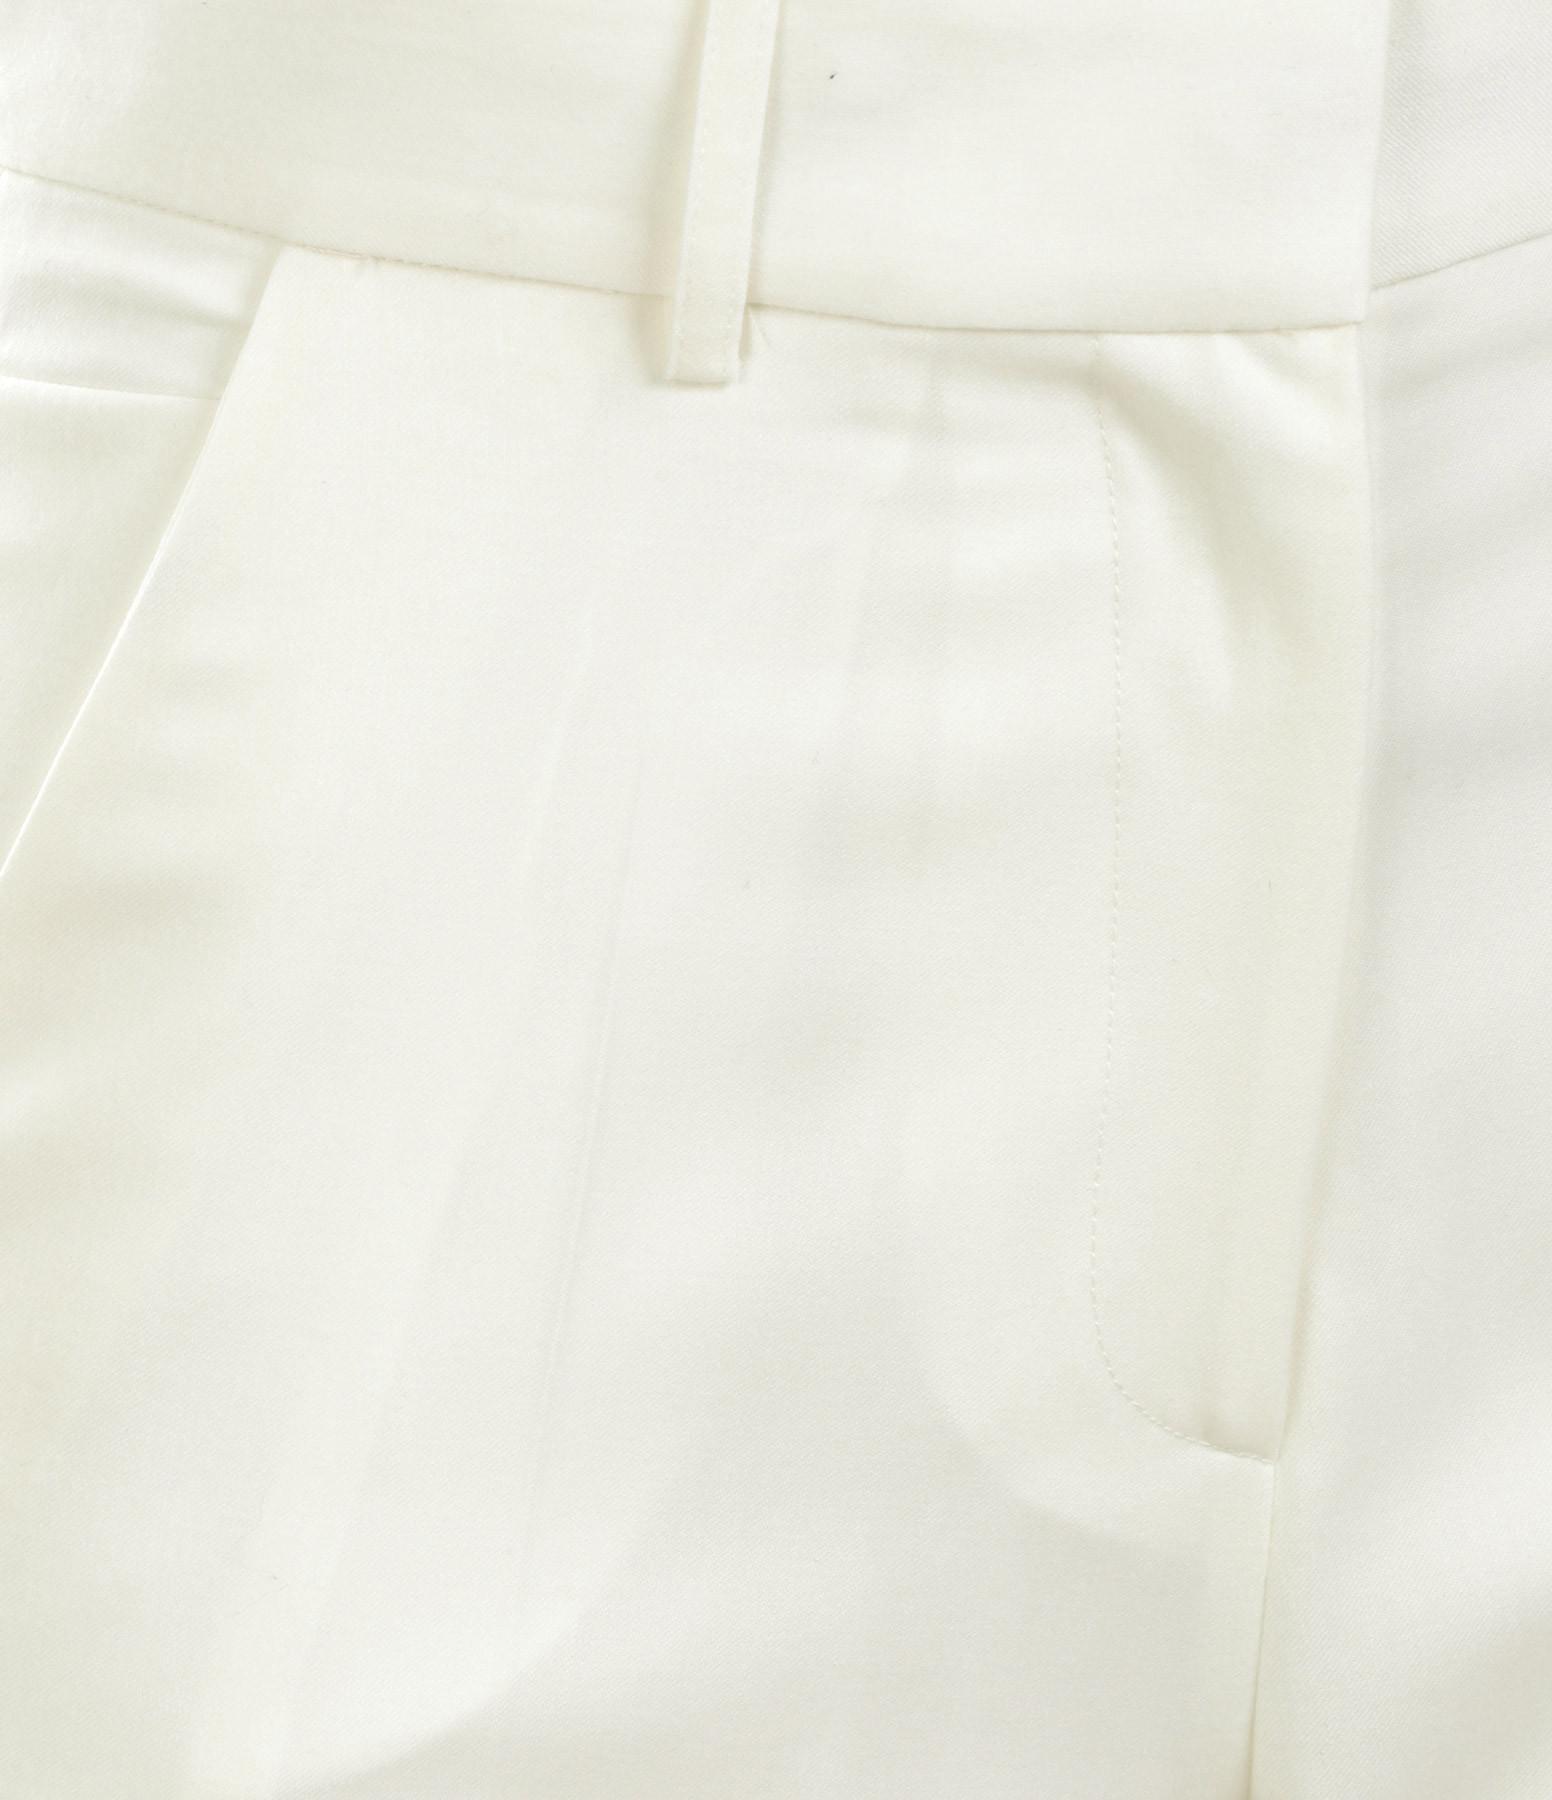 MARGAUX LONNBERG - Pantalon Anatole Blanc